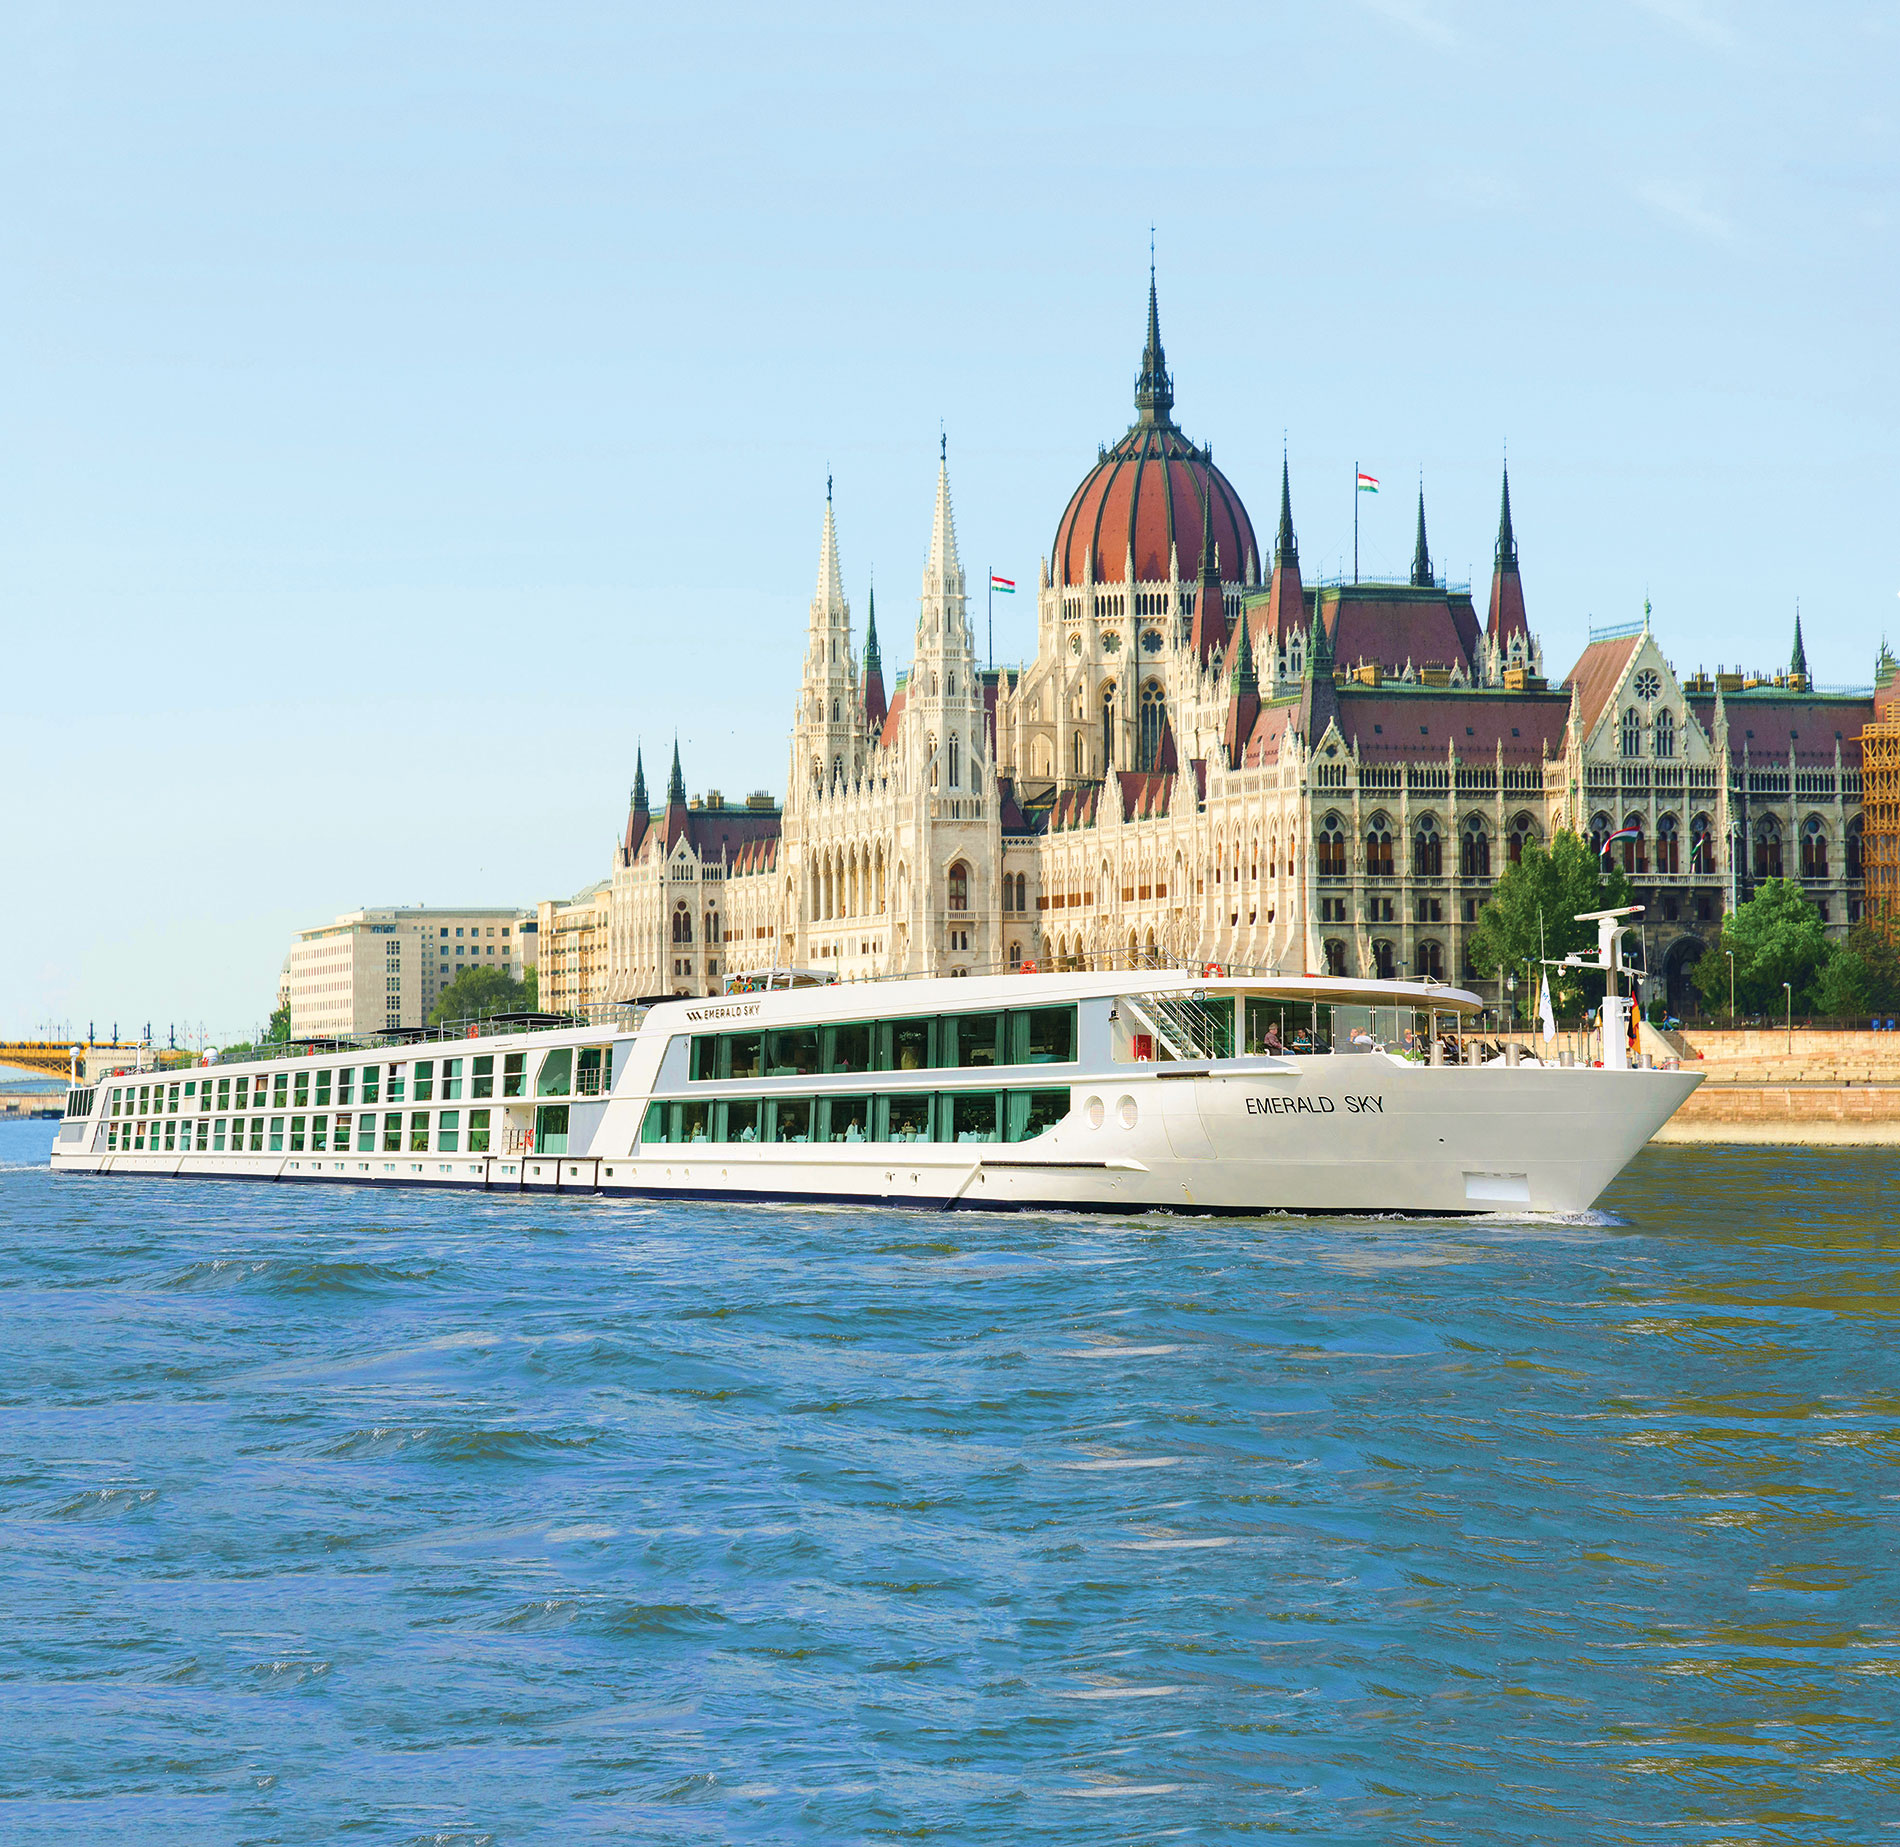 5 Star Luxury River Cruises Through Eurooe: River Cruise Holidays 2019 & 2020